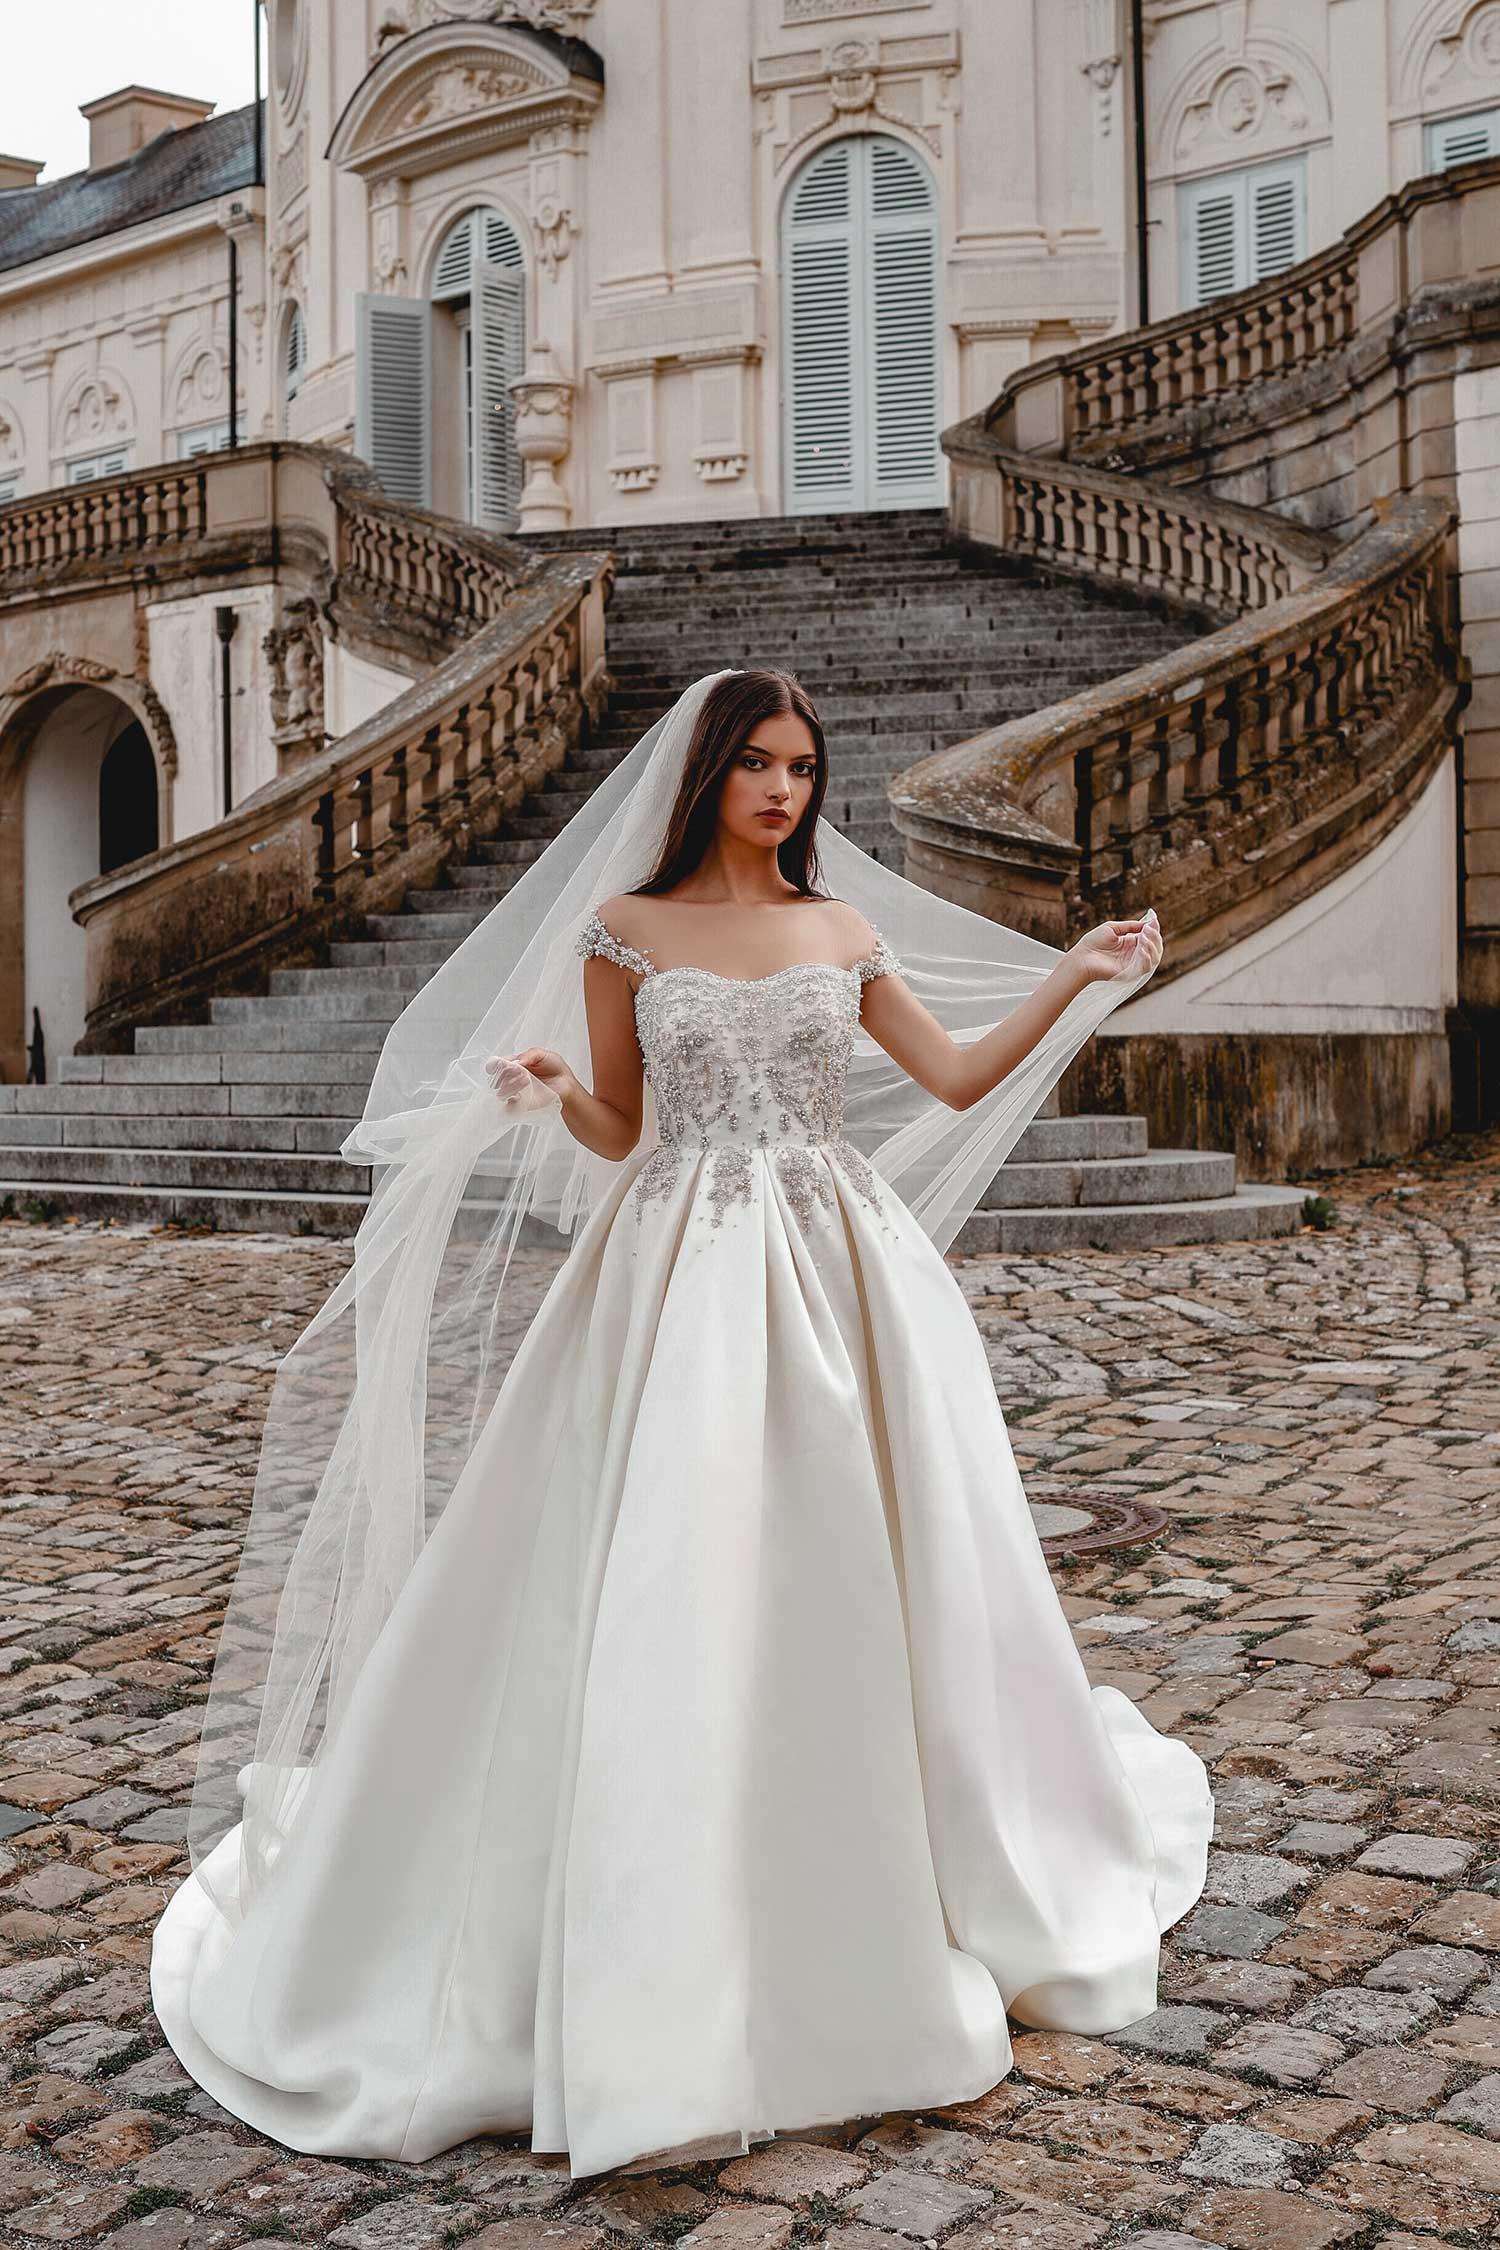 Bridal model wearing a veil